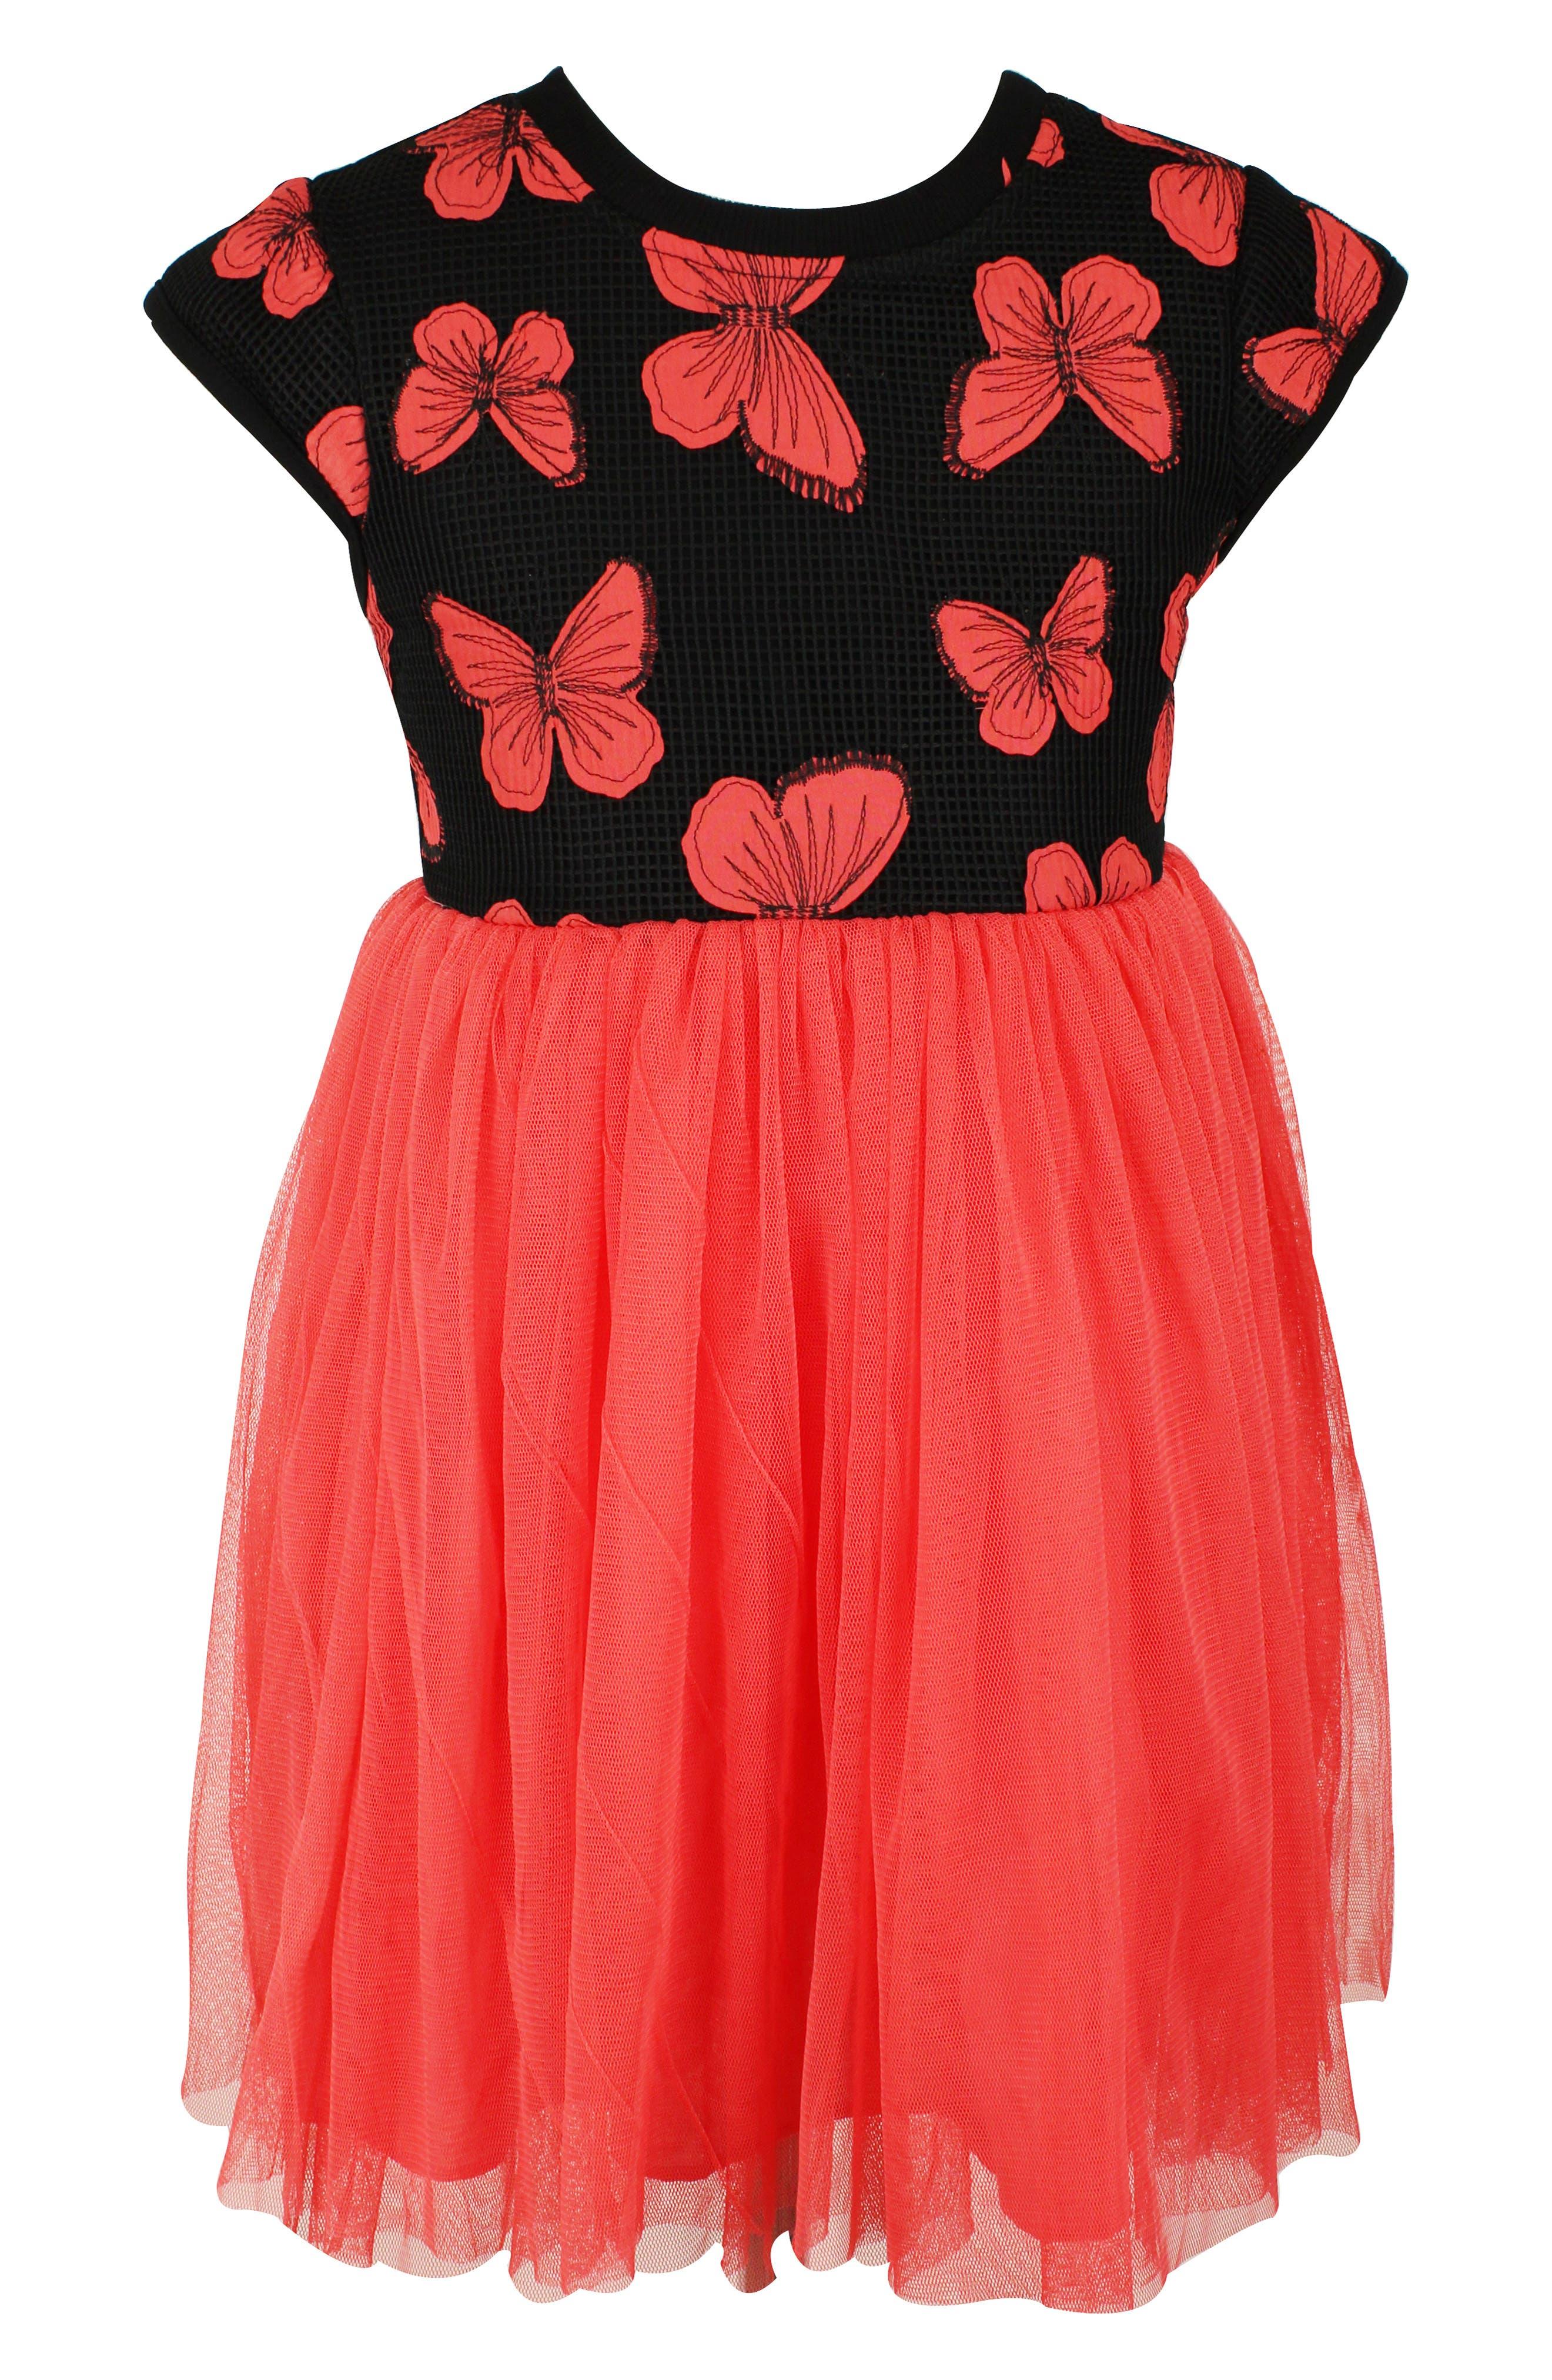 POPATU, Butterfly Tutu Dress, Main thumbnail 1, color, CORAL/ BLACK